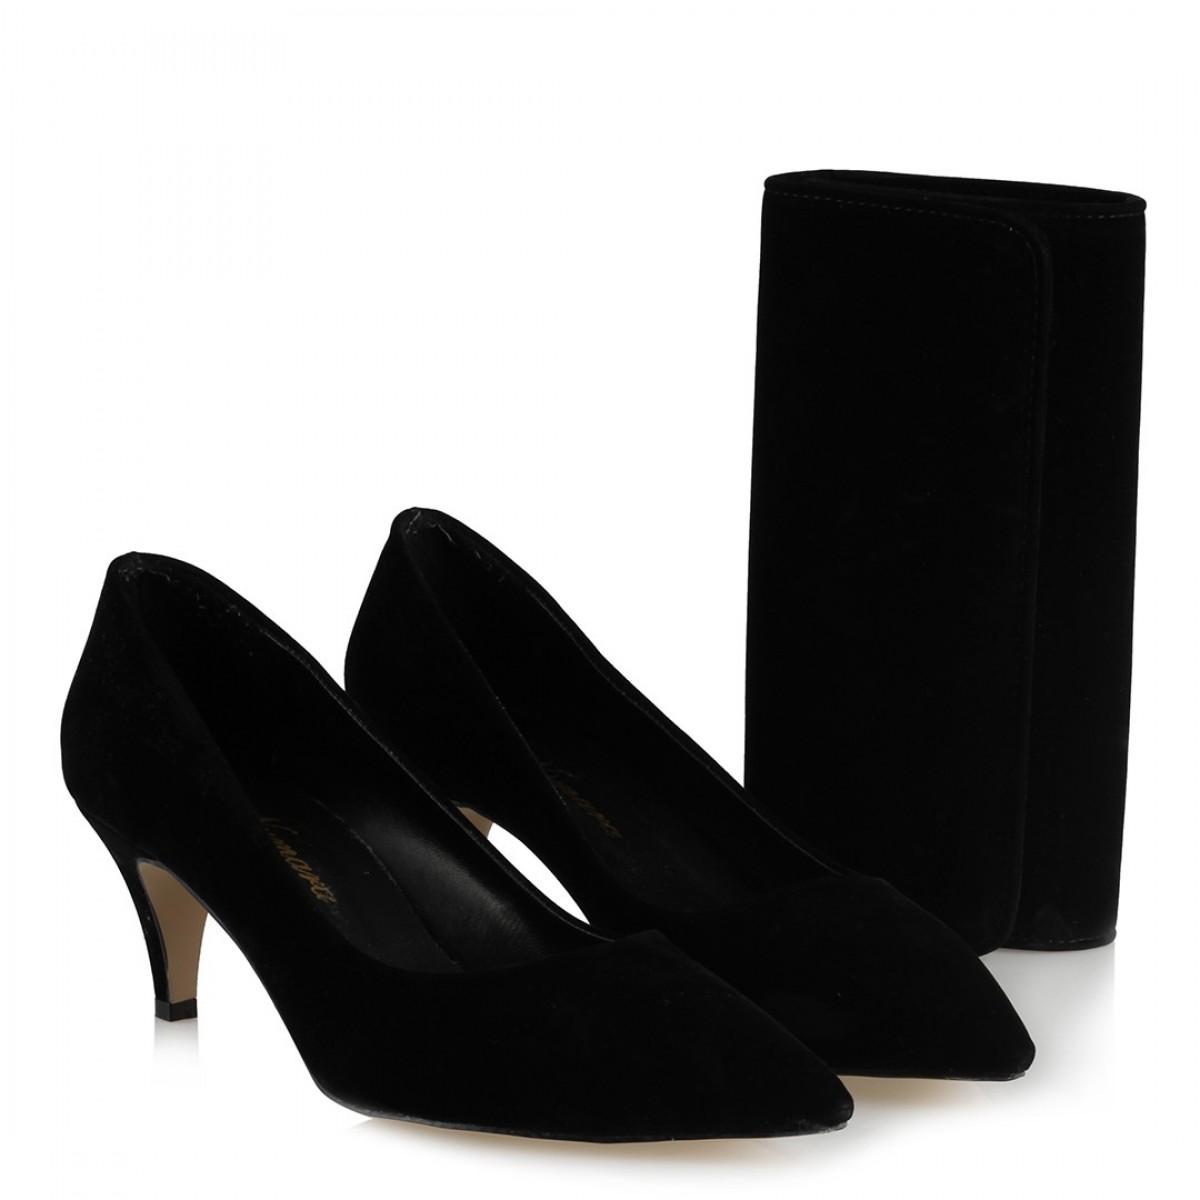 Siyah Az Topuklu Stiletto Ayakkabı Portföy Çanta Kombin